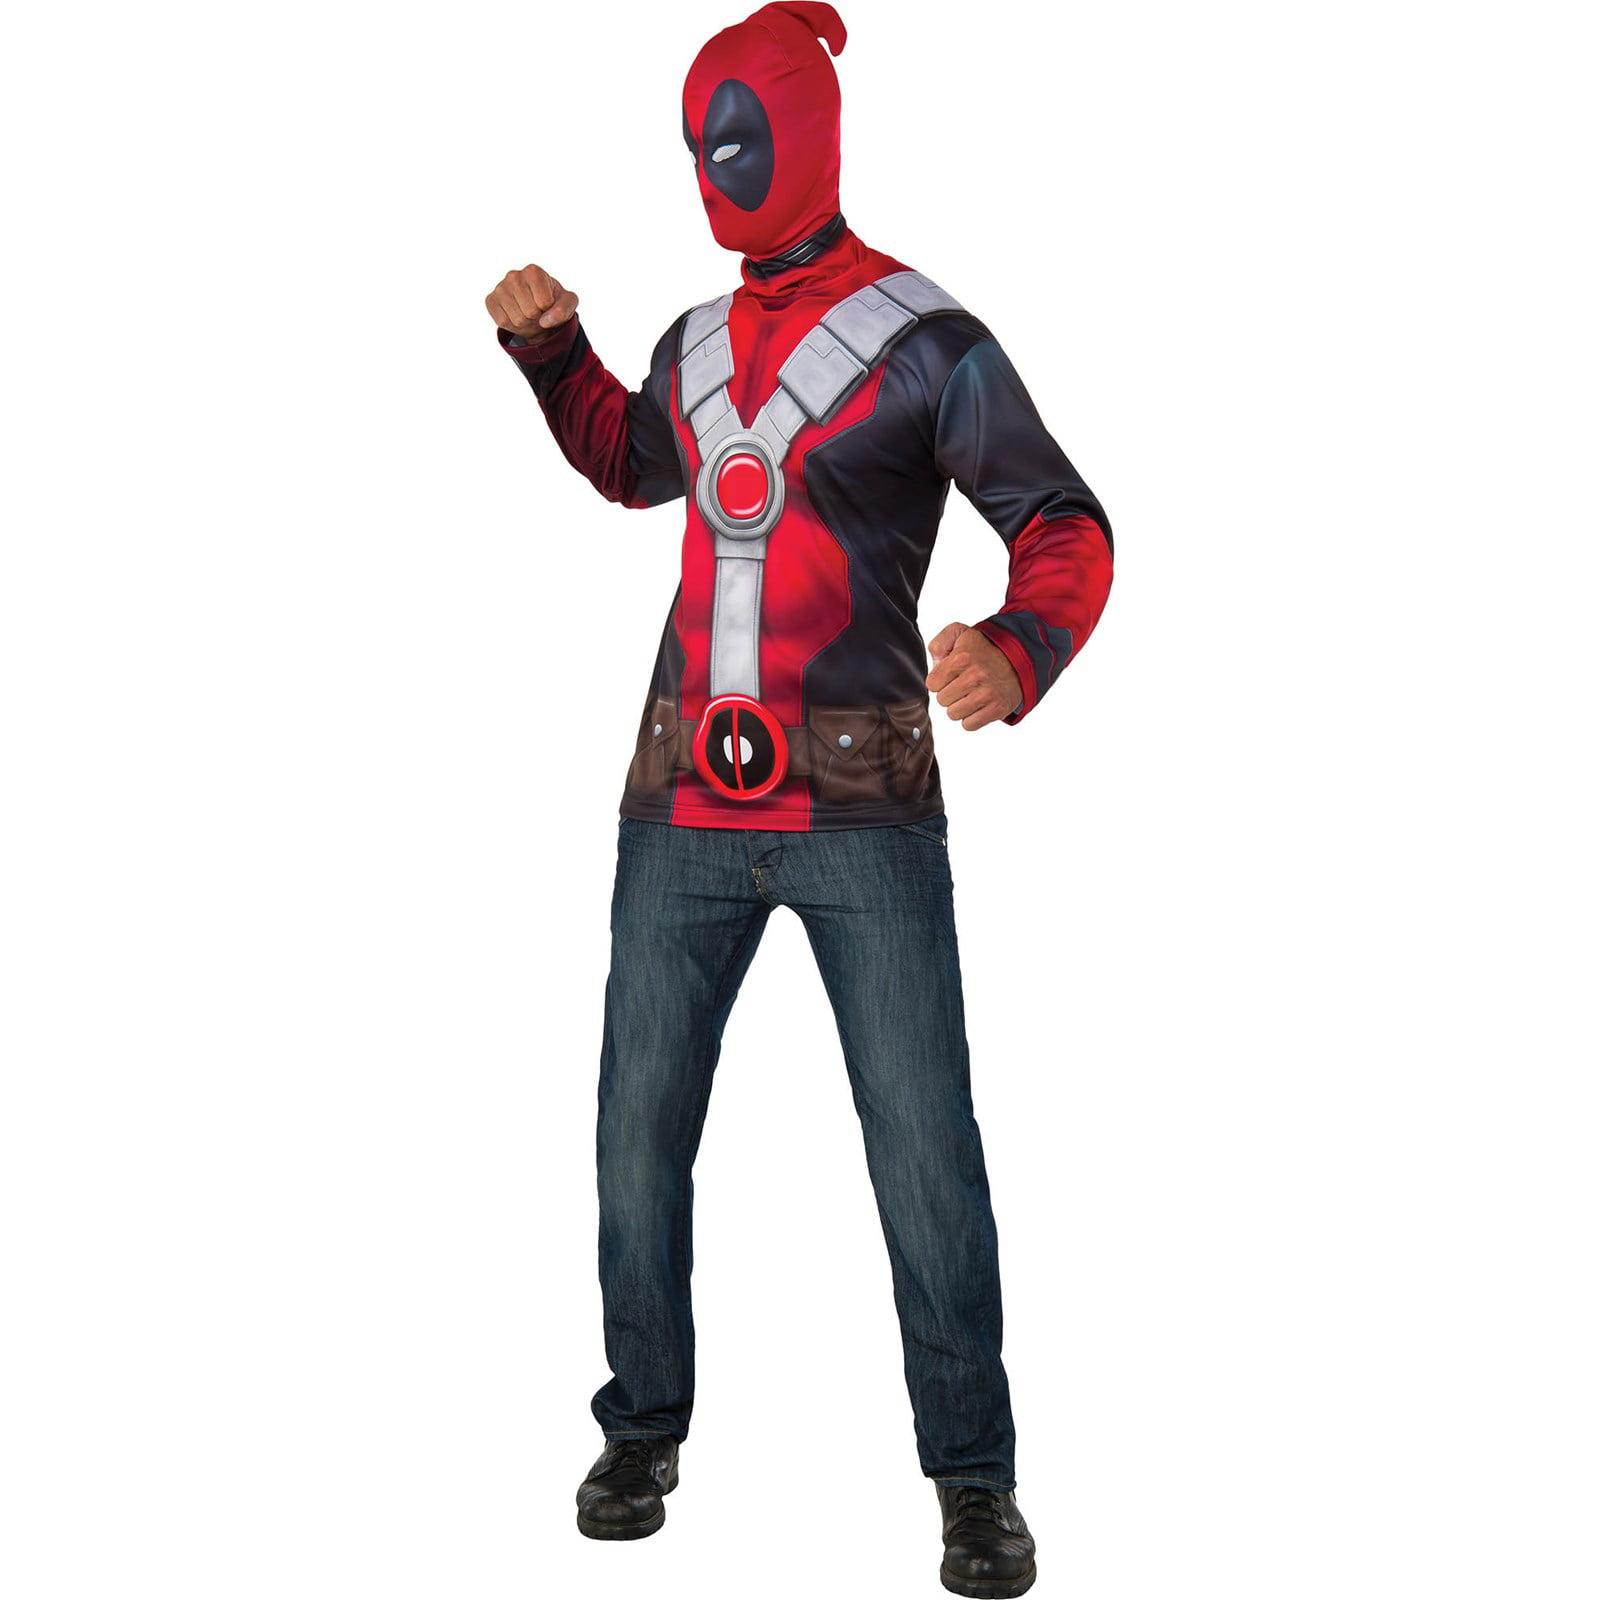 Deadpool Adult Halloween Costume Weapon Kit